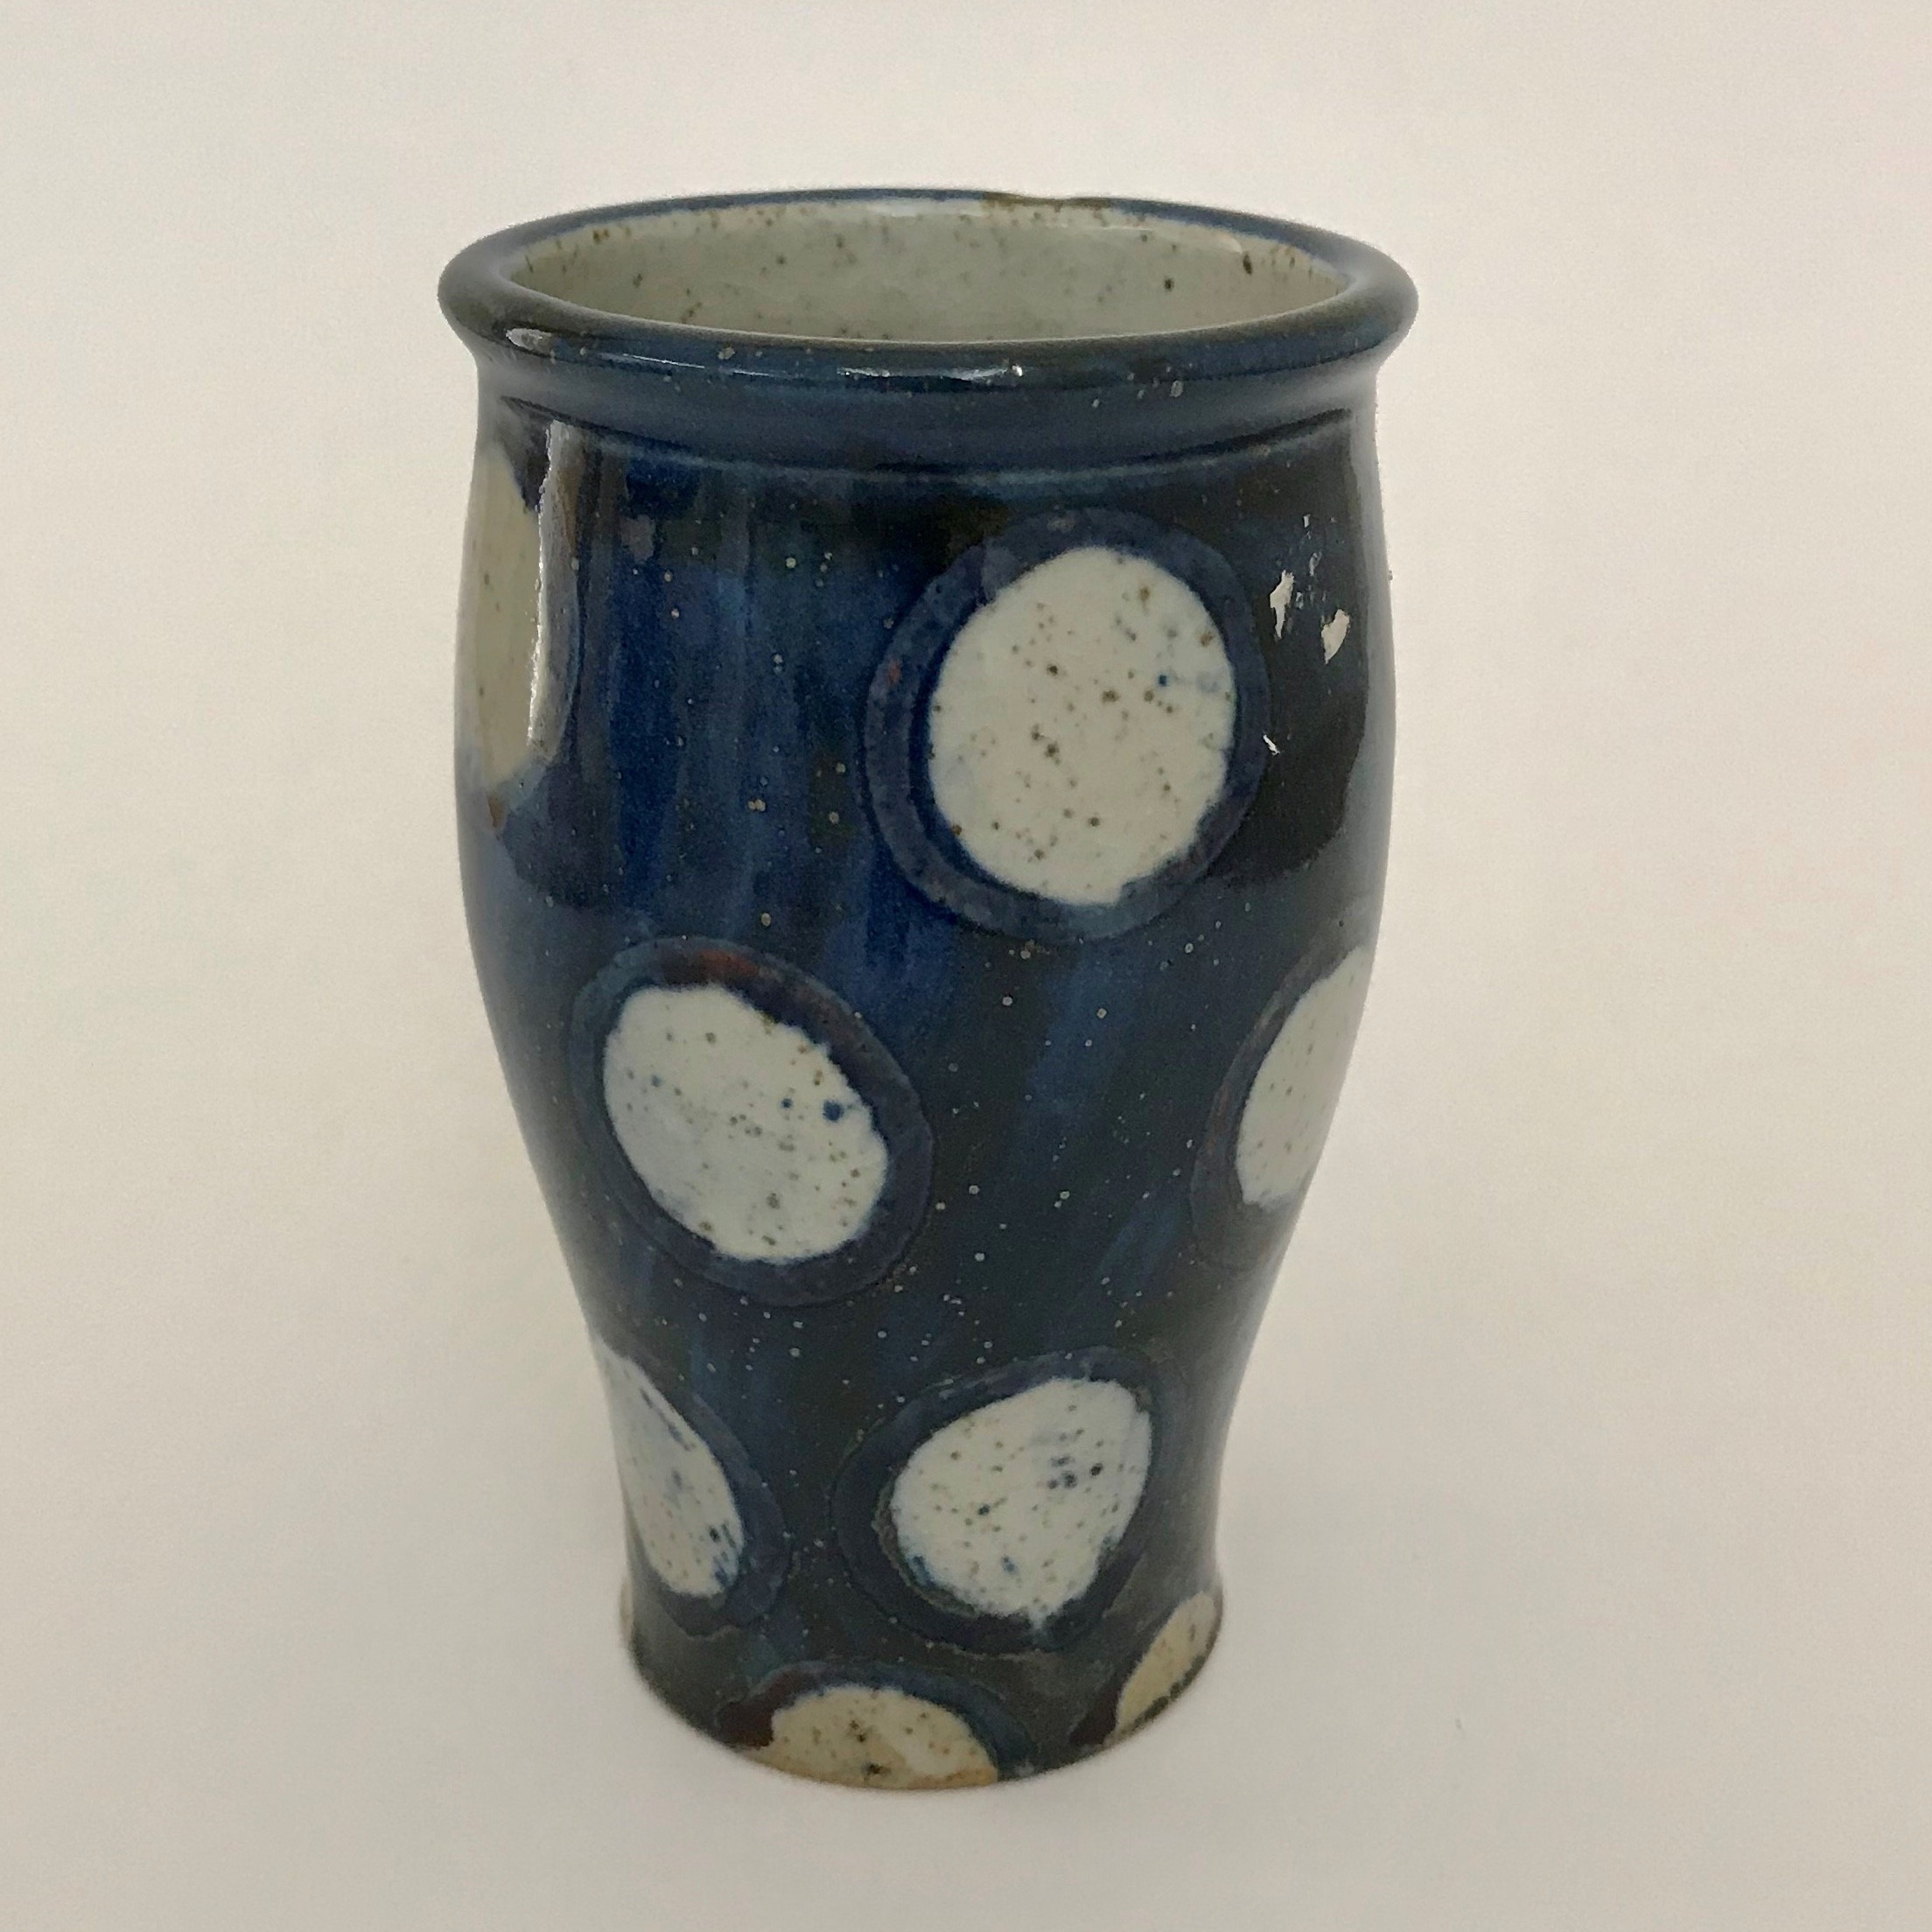 Small Vase SP £25